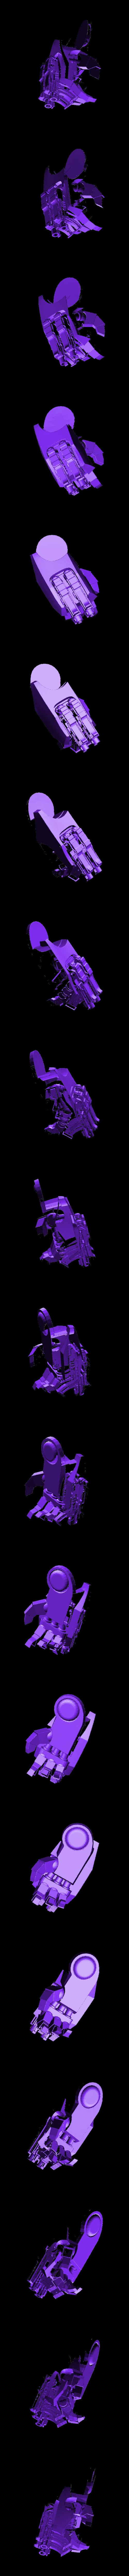 Wep_PF.stl Download free STL file 28mm Cosmo Knight Naismith Pattern Tomb Walker • 3D printer model, Miffles_Makes